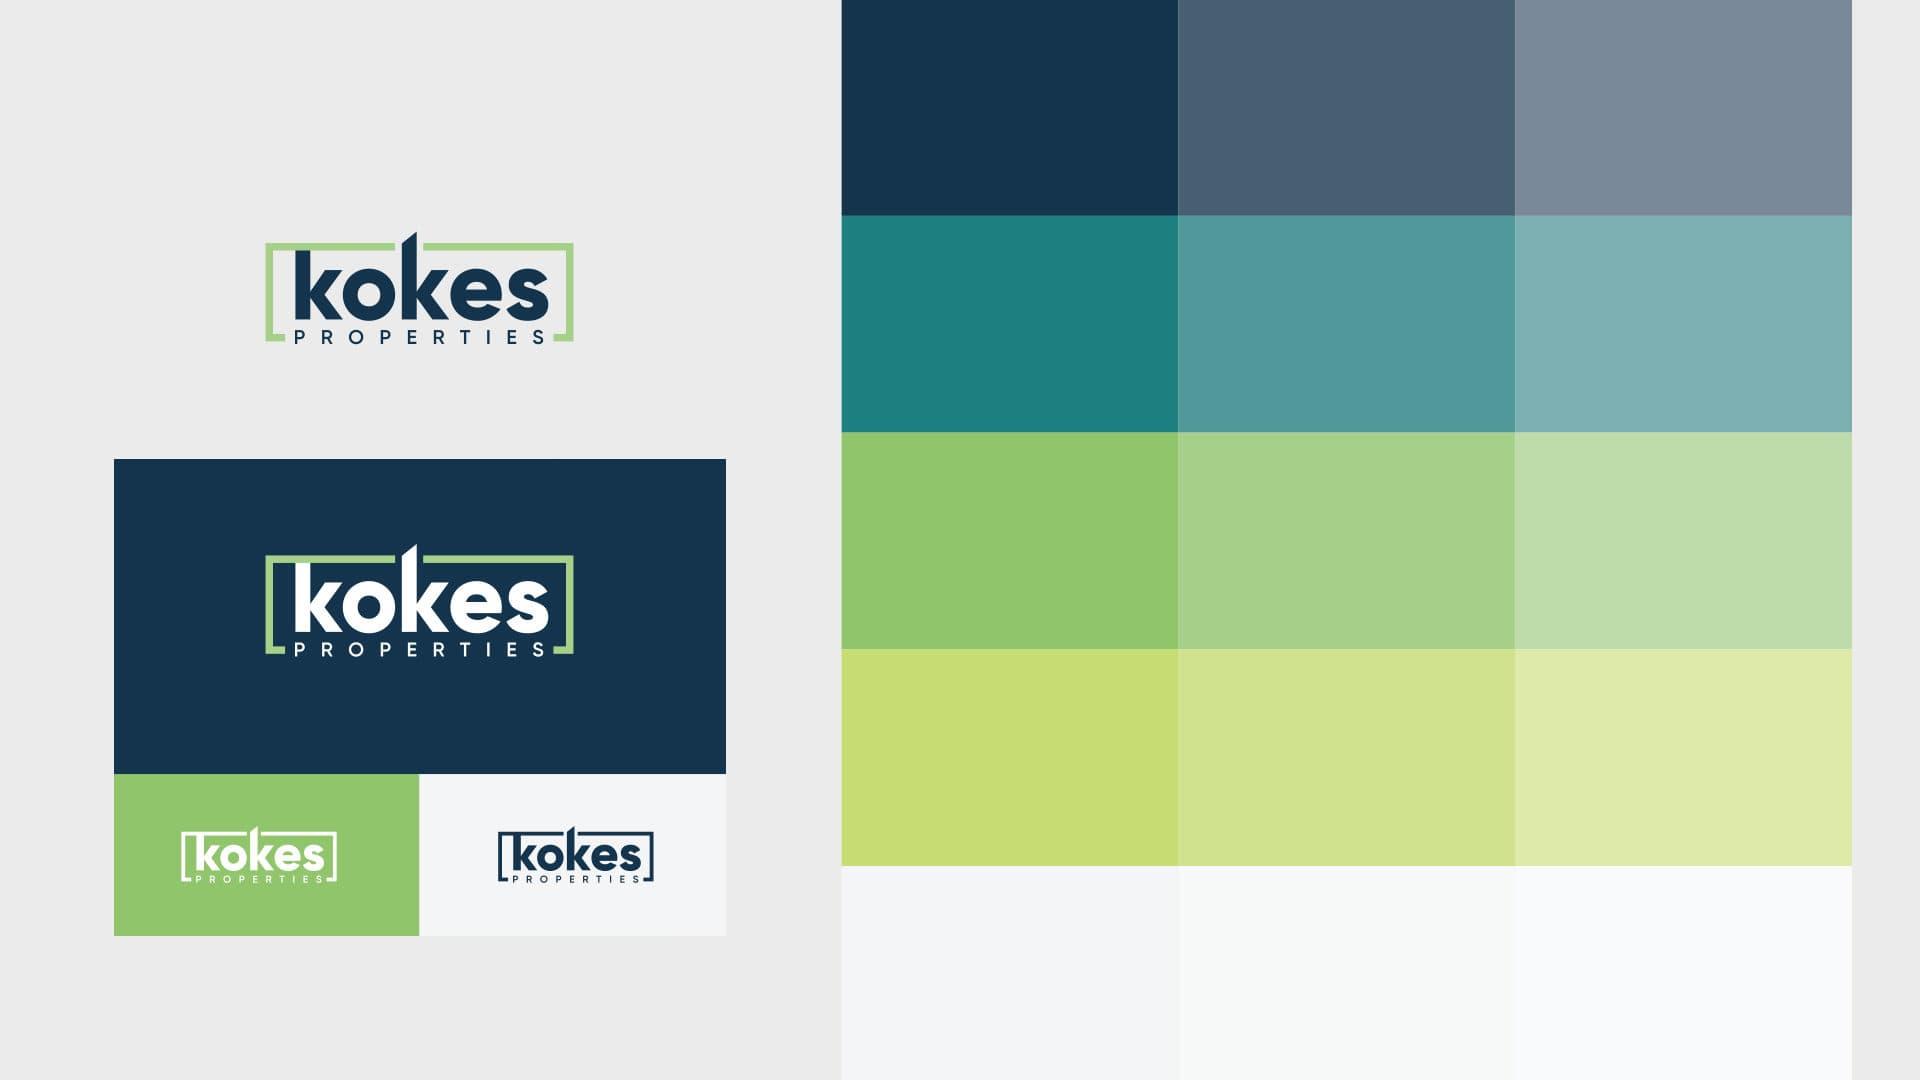 Kokes Brand Development